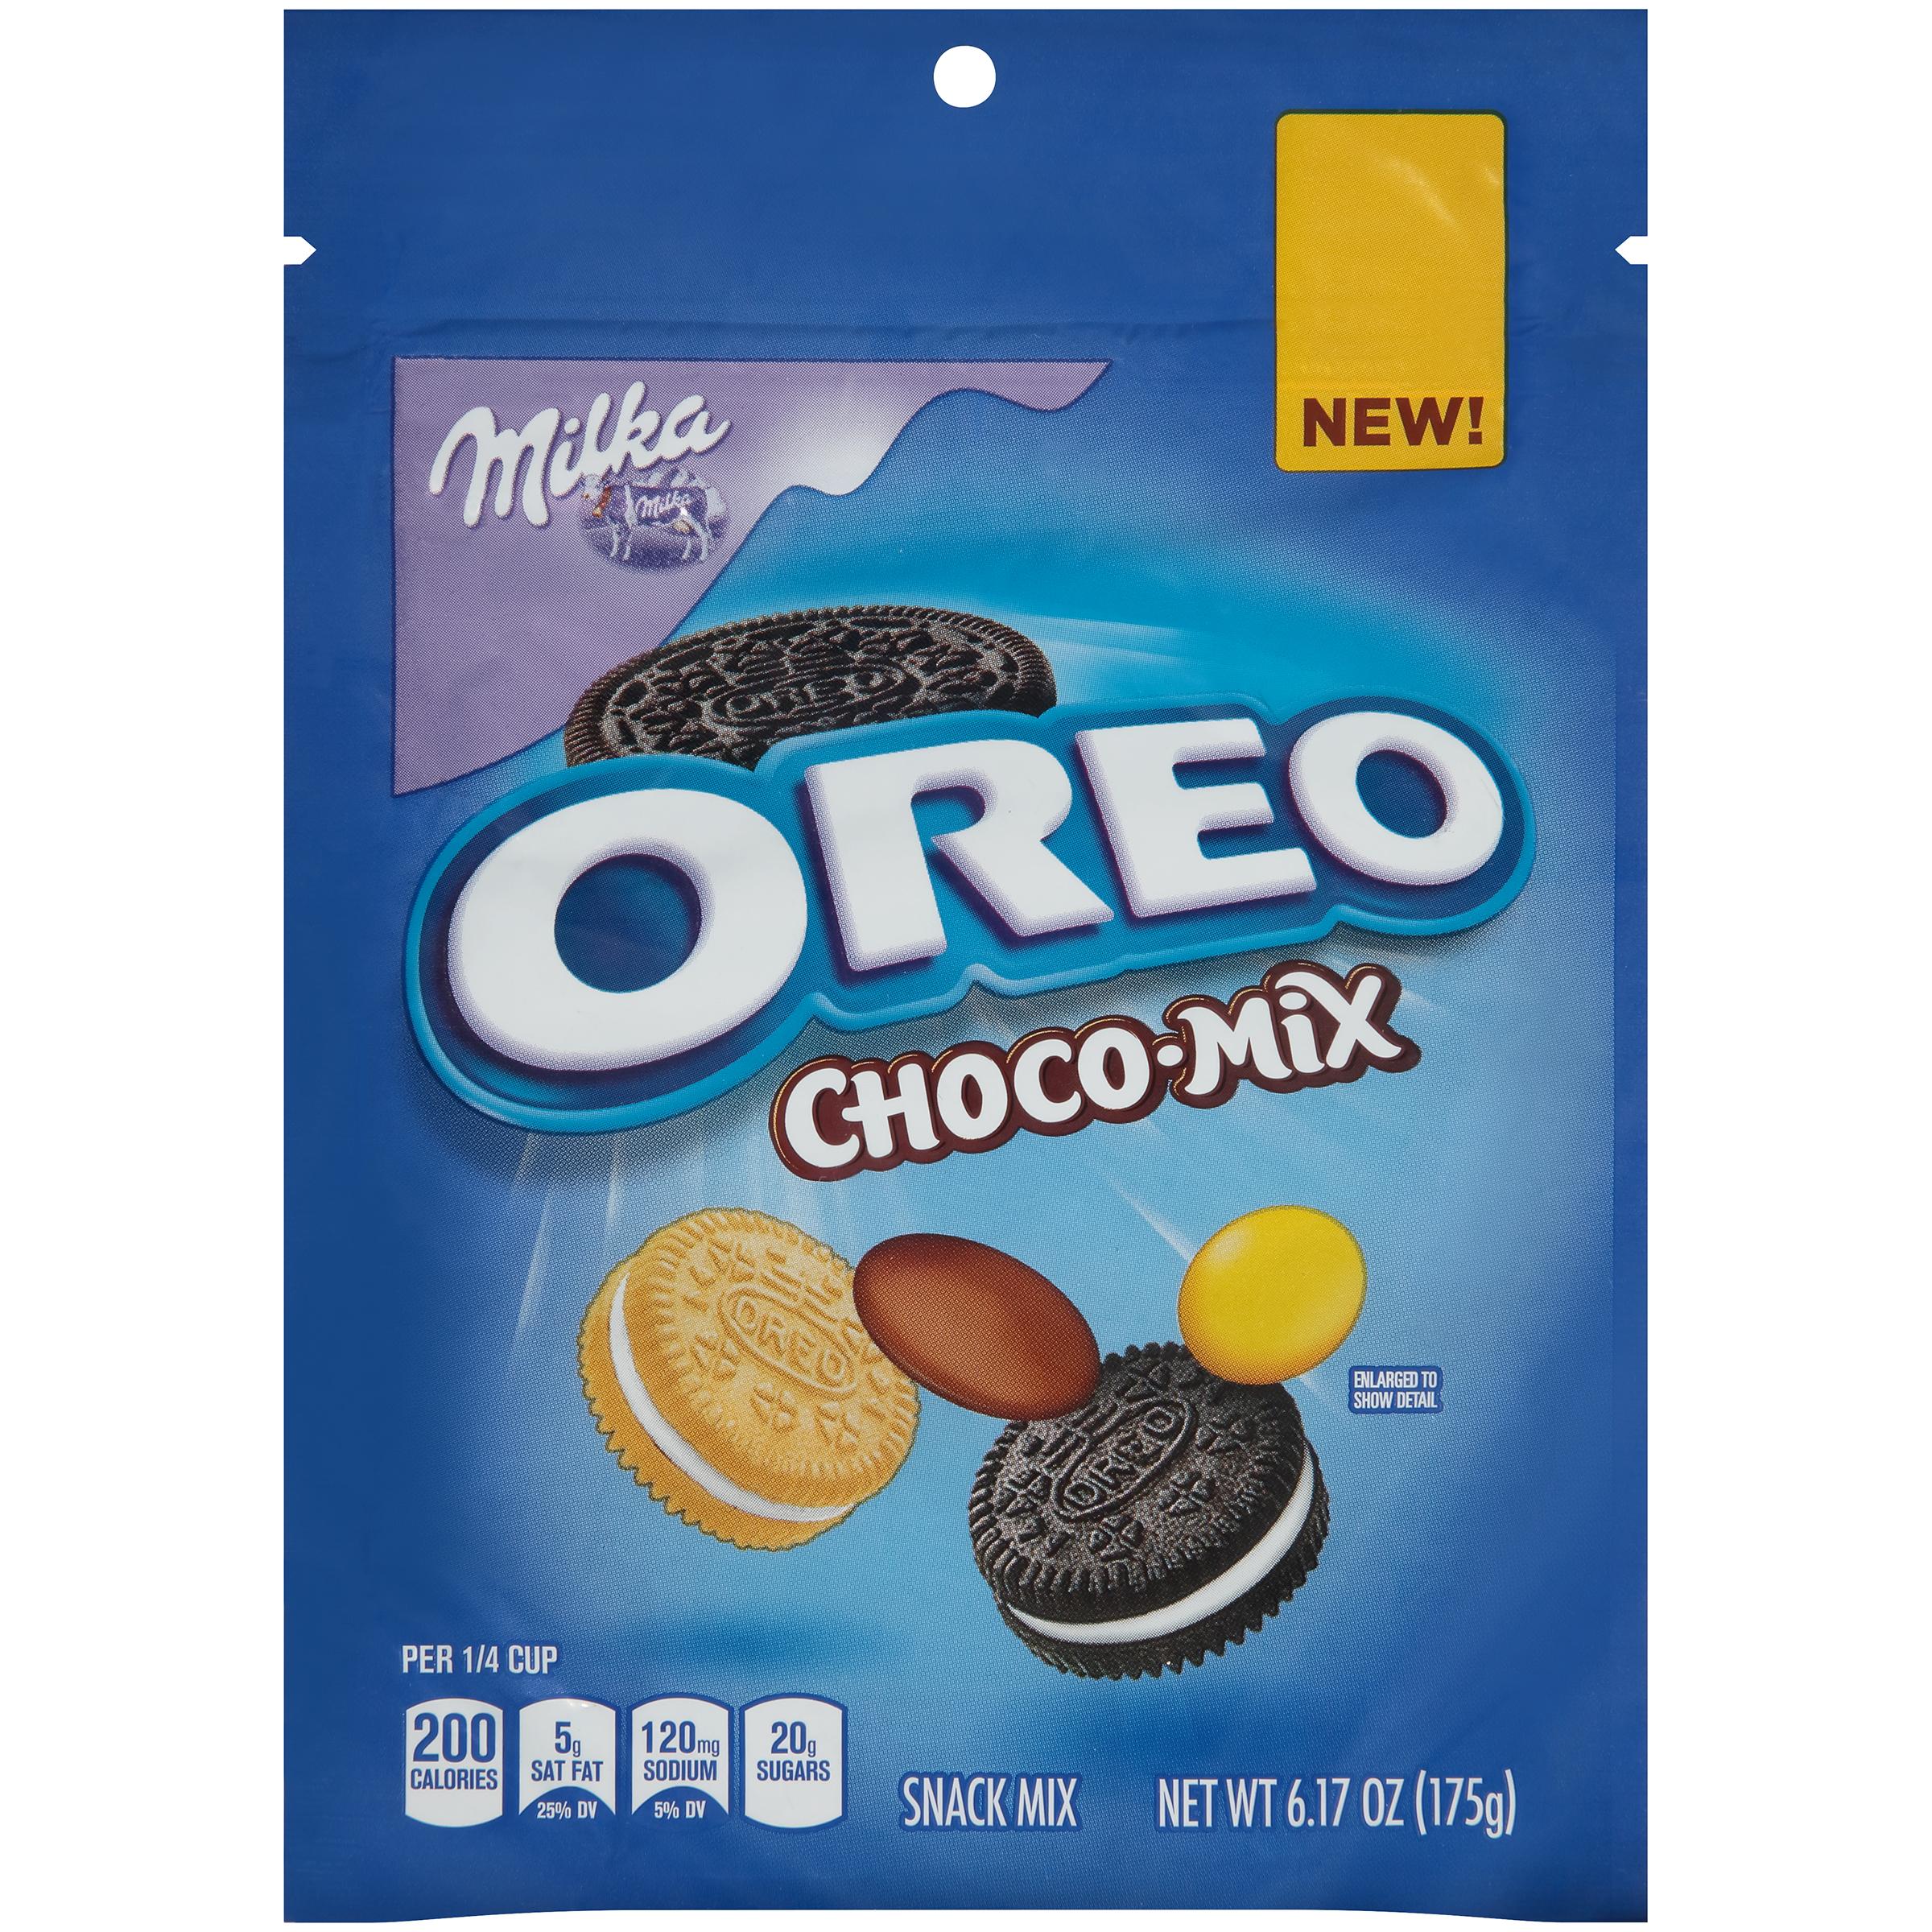 Milka Oreo Choco-Mix Snack Mix Bag, 6.17 oz